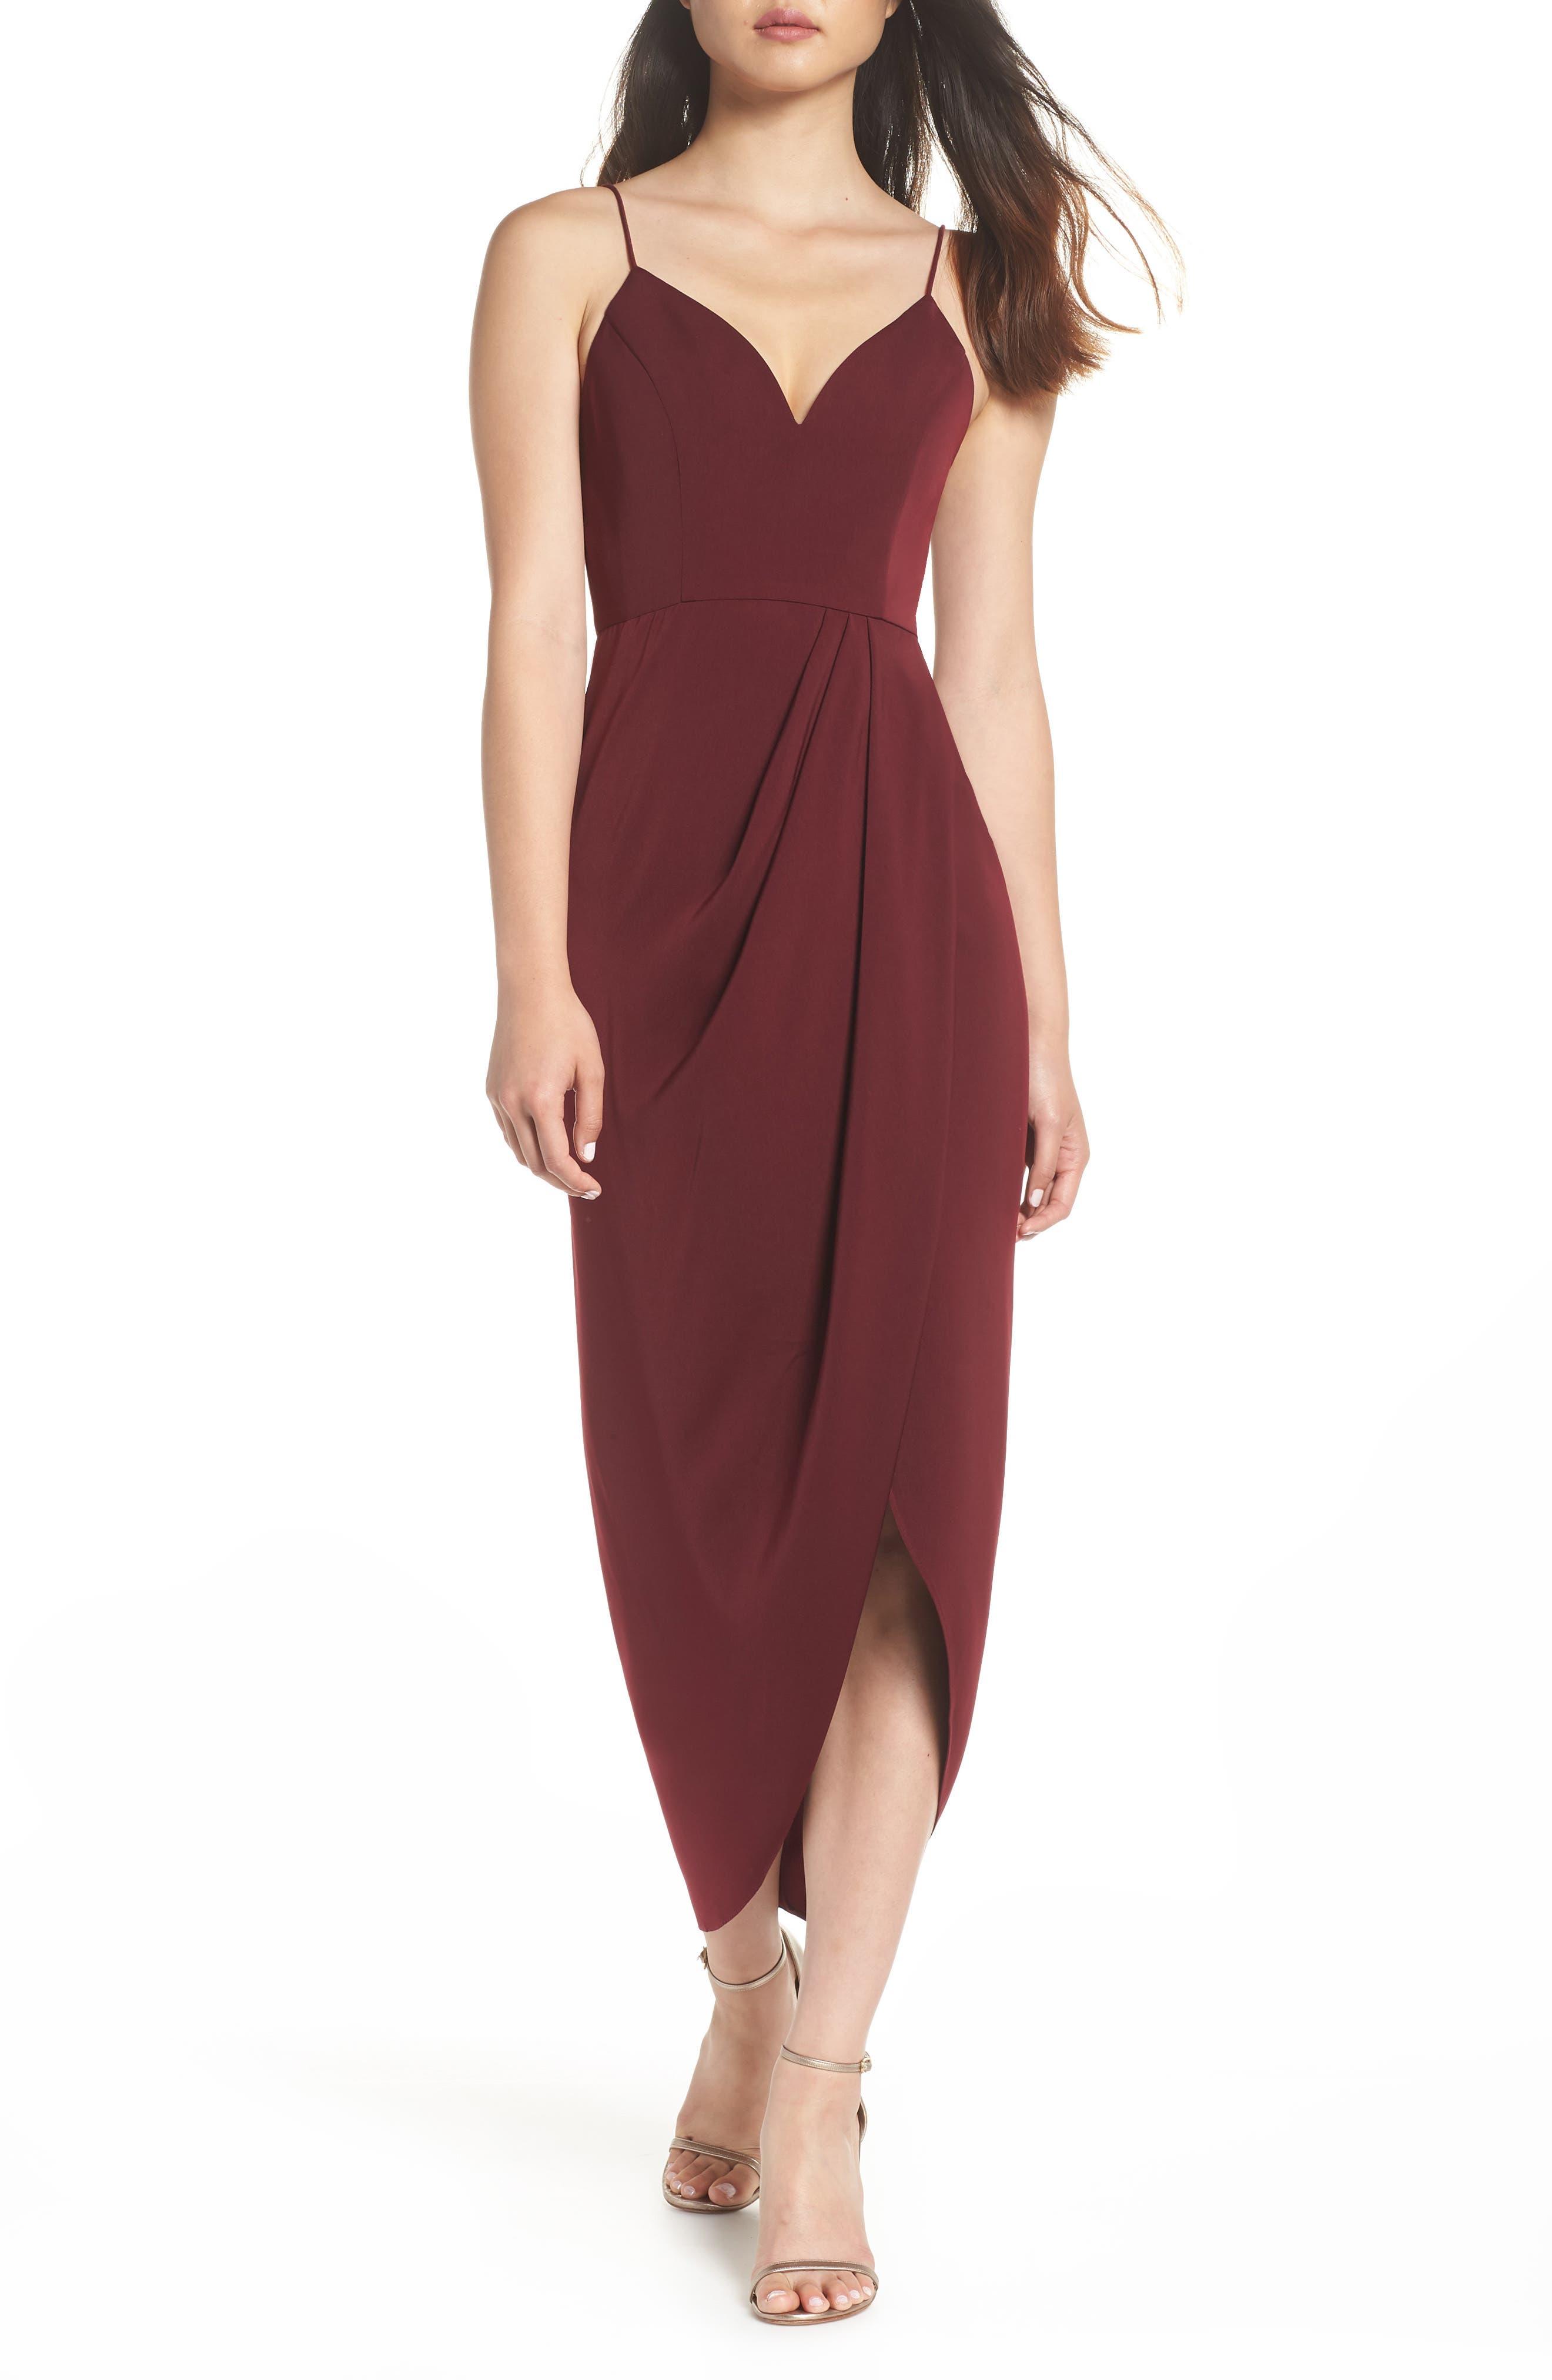 SHONA JOY Tulip Hem Maxi Dress in Burgundy